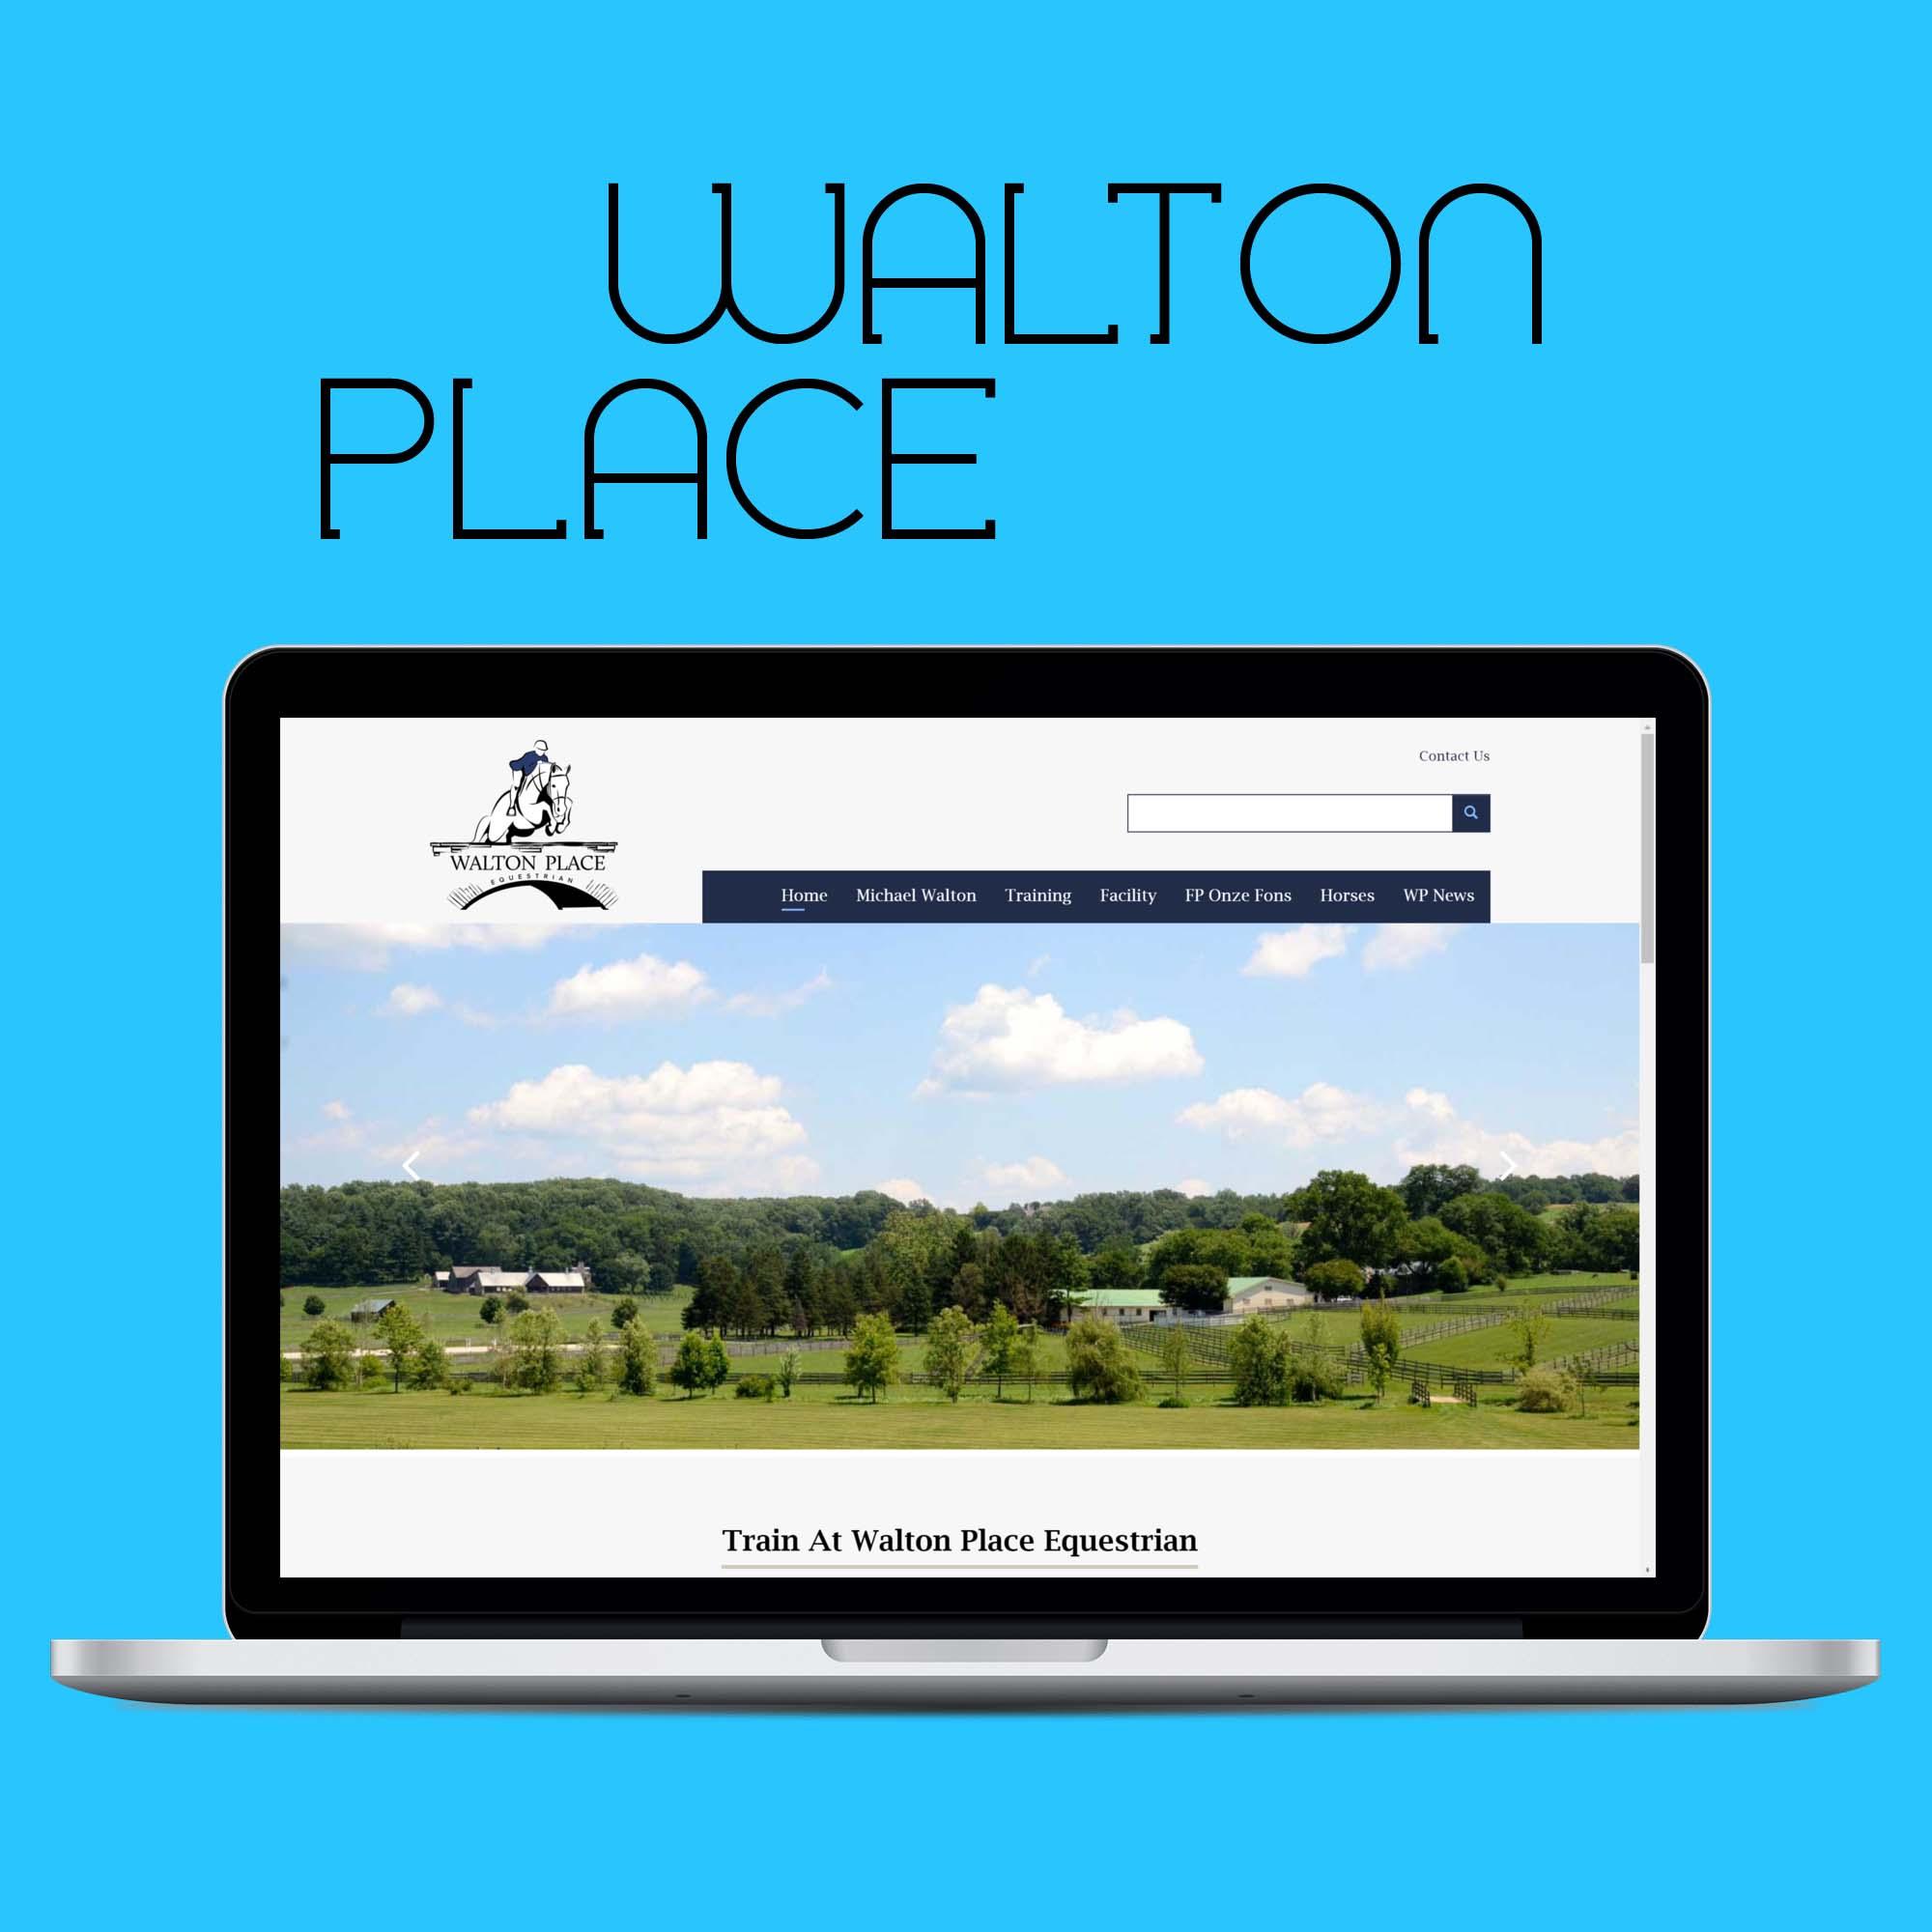 www.waltonplaceequestrian